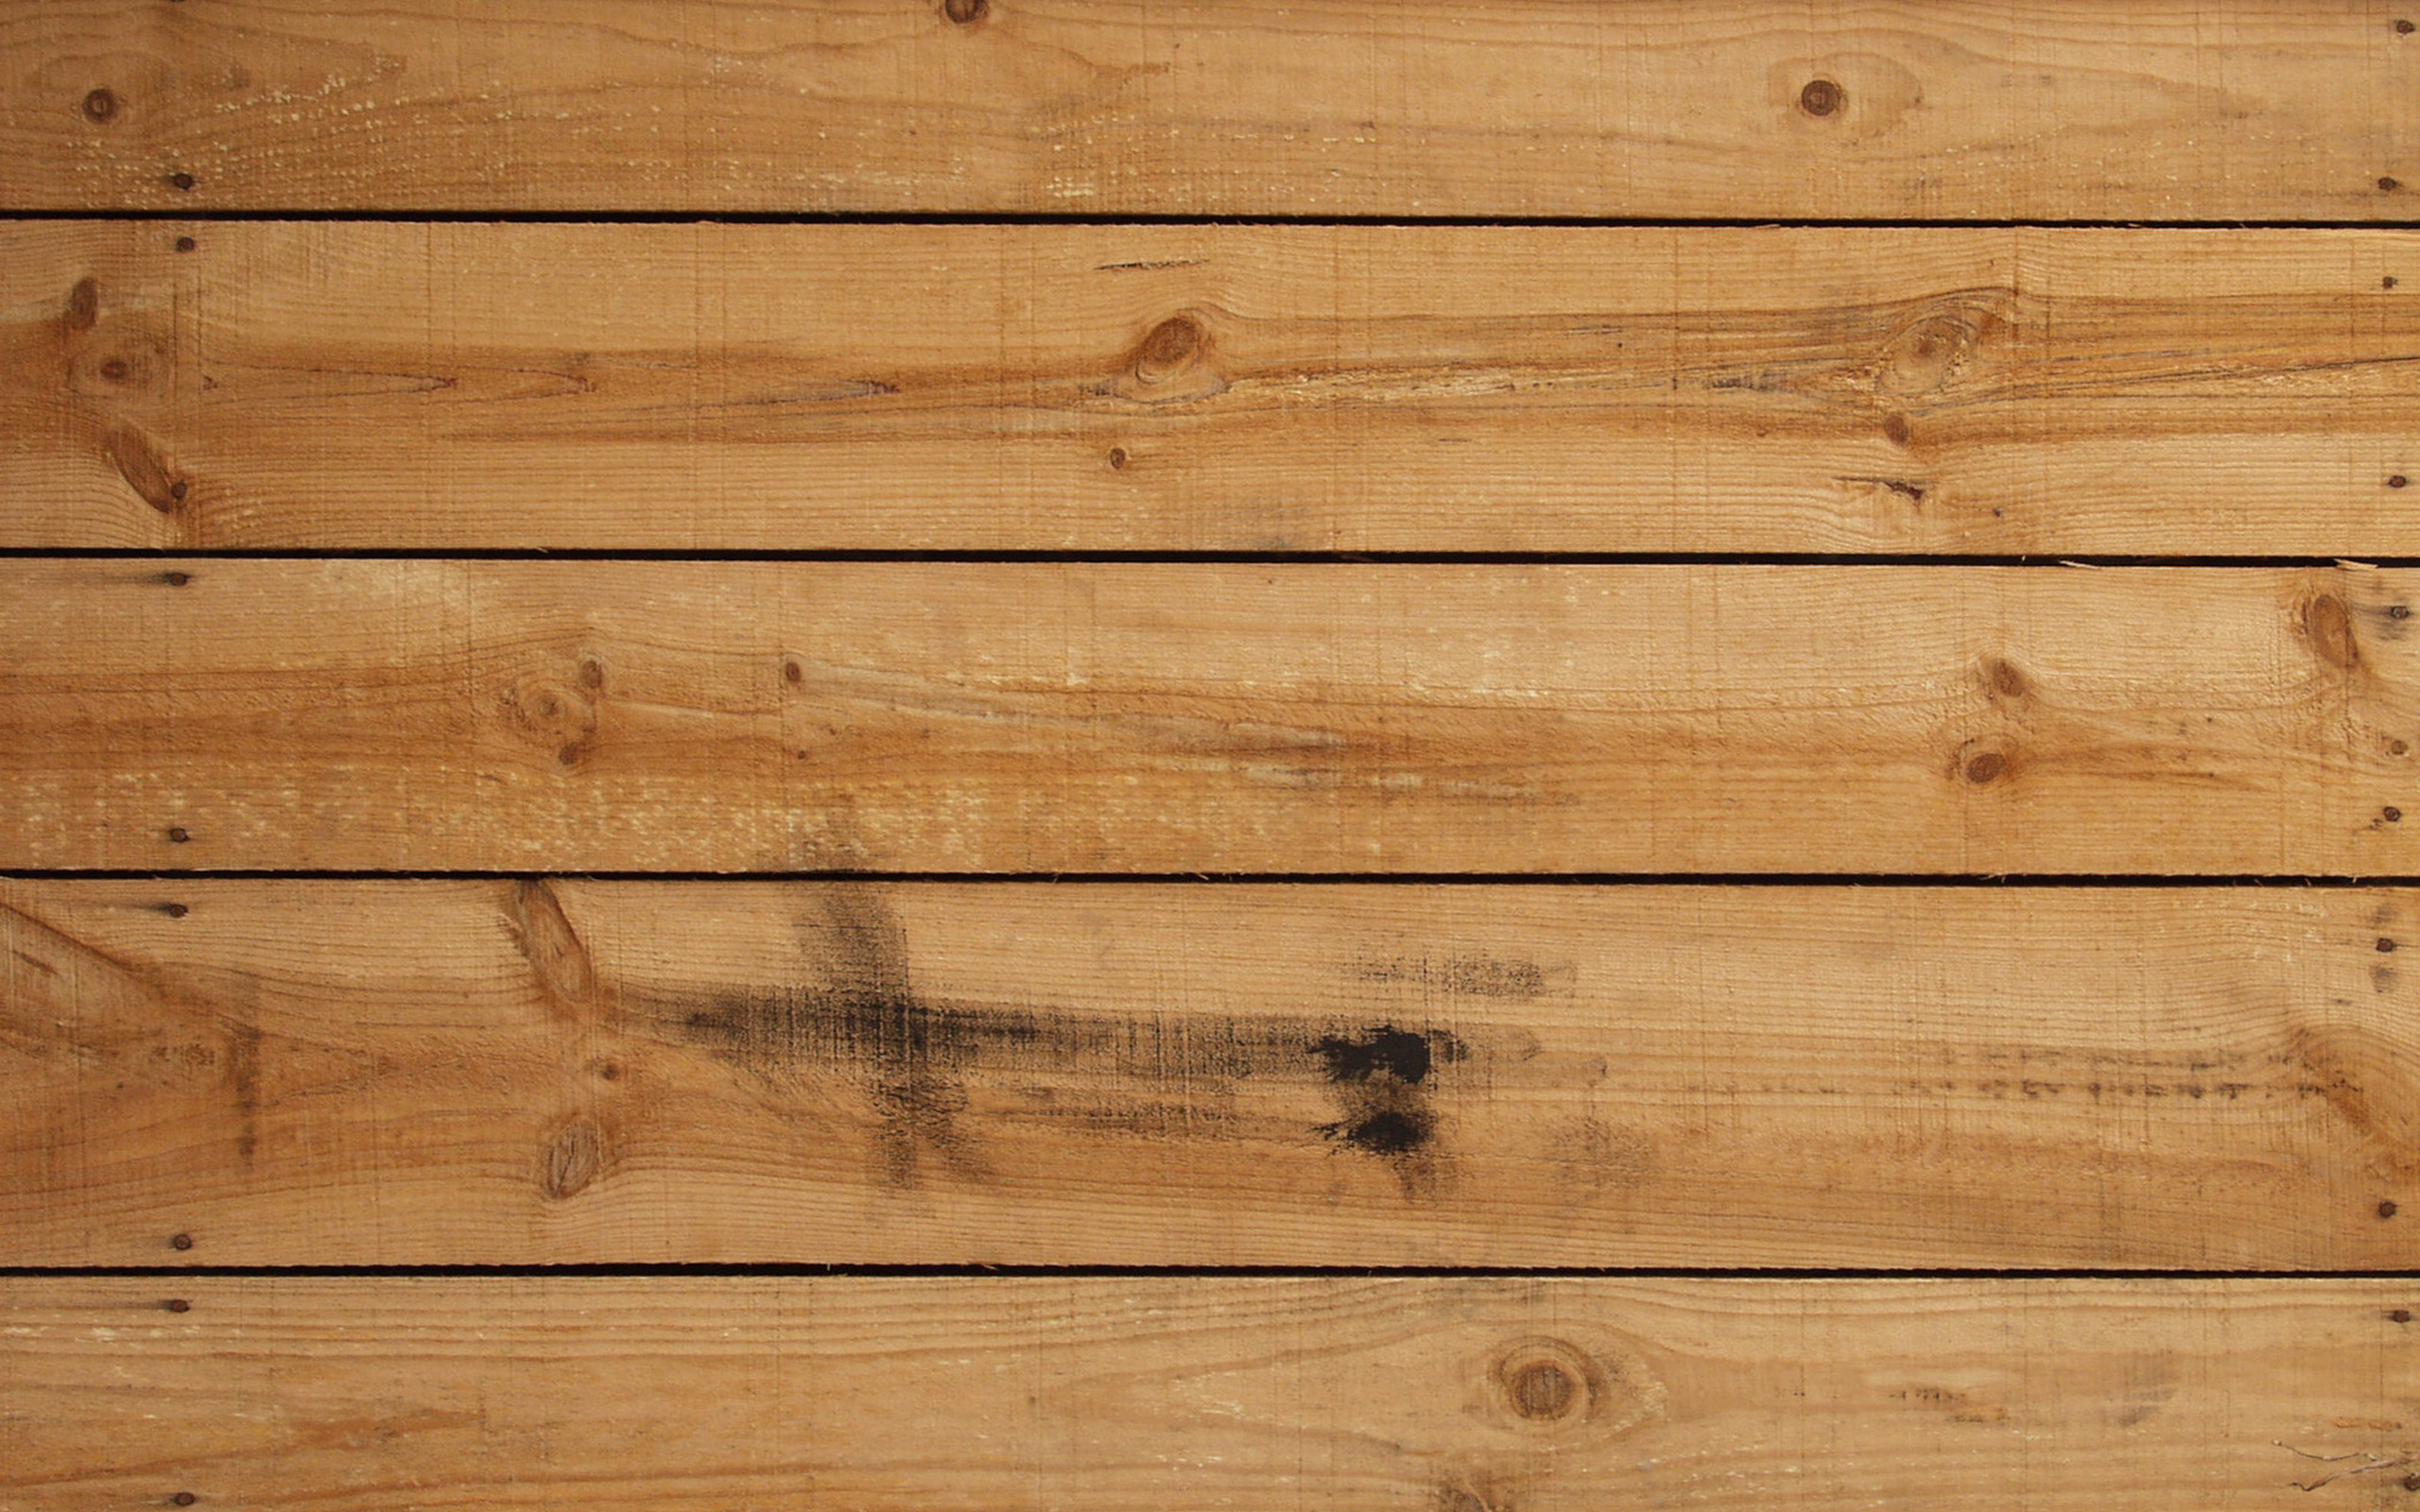 wood desk top view - photo #10